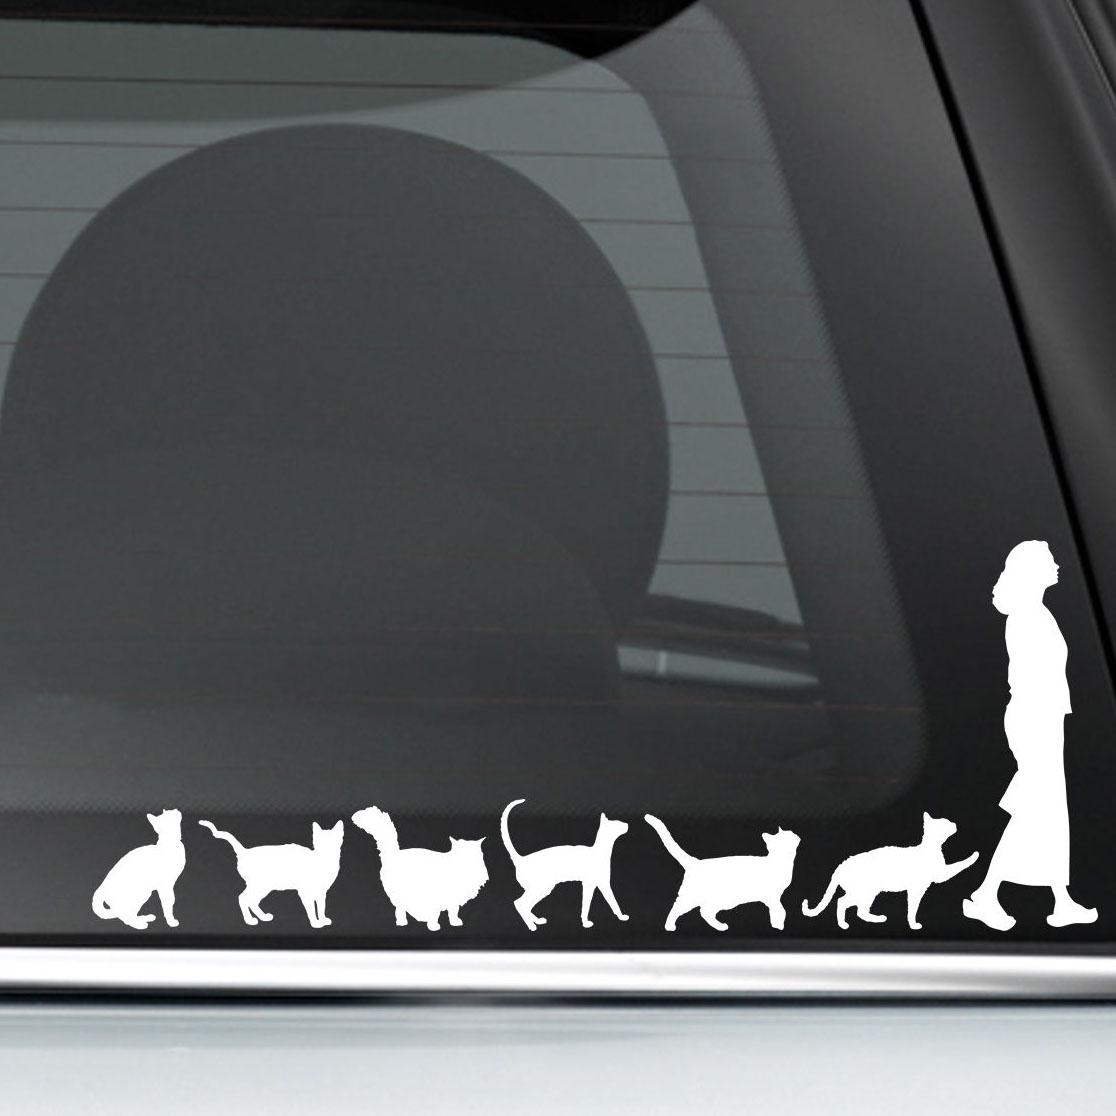 Horayten Car Styling Vinyl Decal Warning Missing Cat Lady Friendly Love Boys Auto Window Tail Sticker 180x45mm